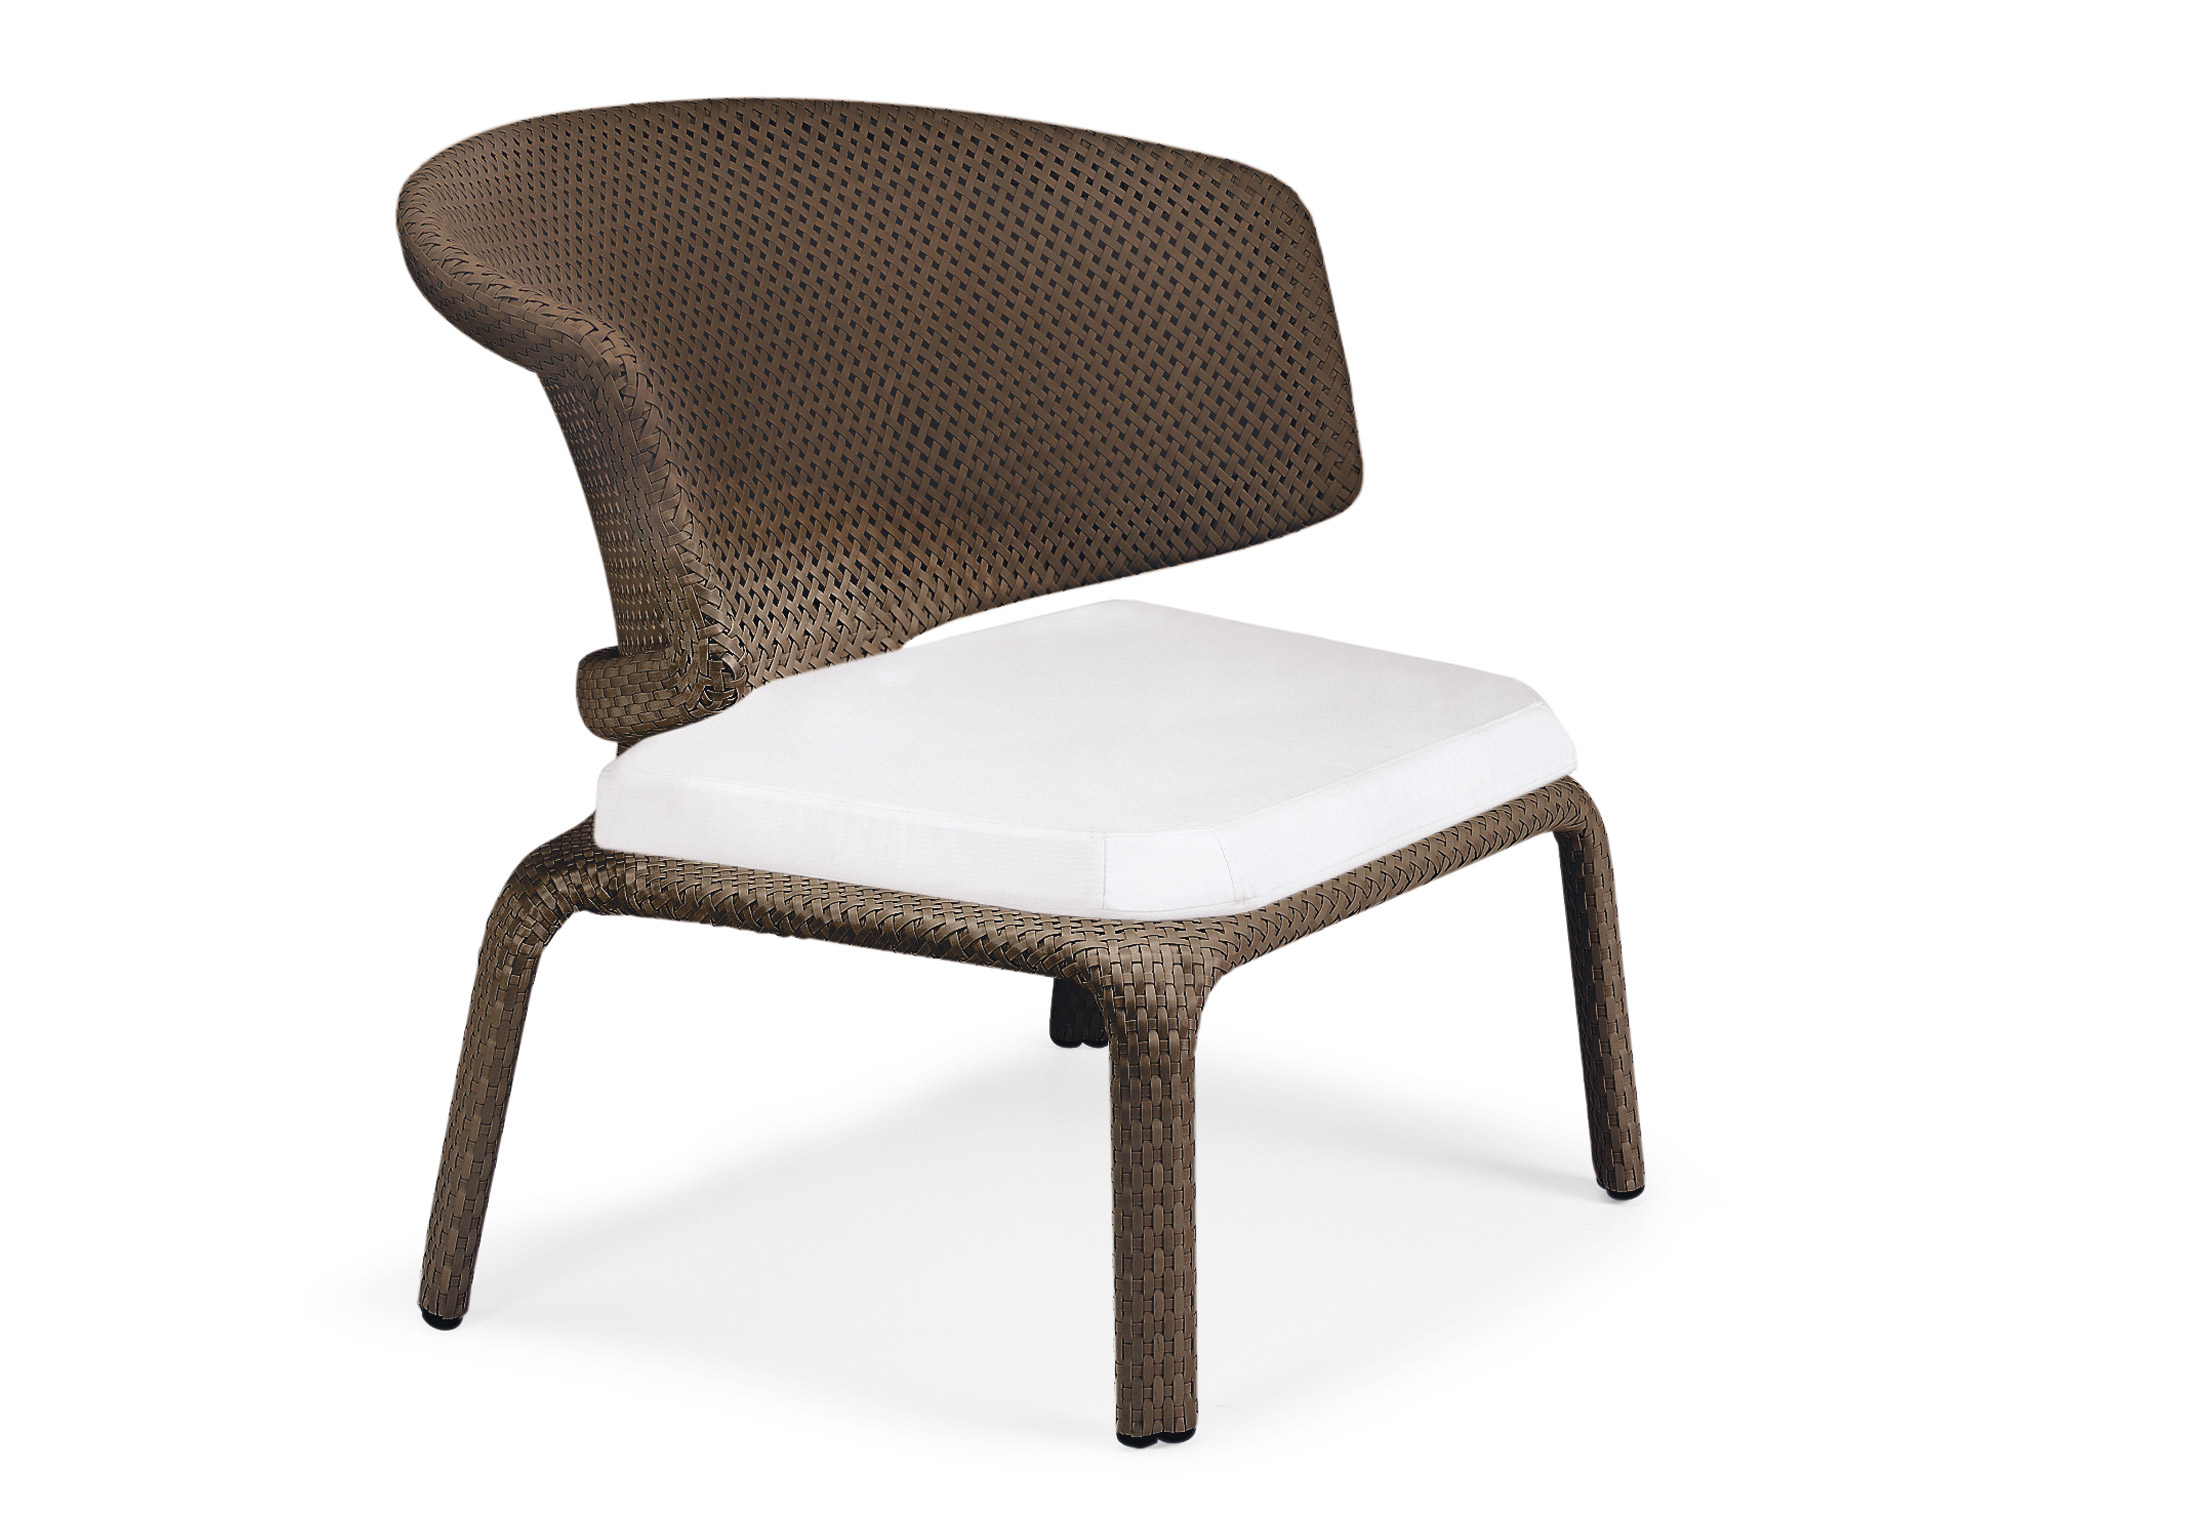 SEASHELL lounge chair by DEDON